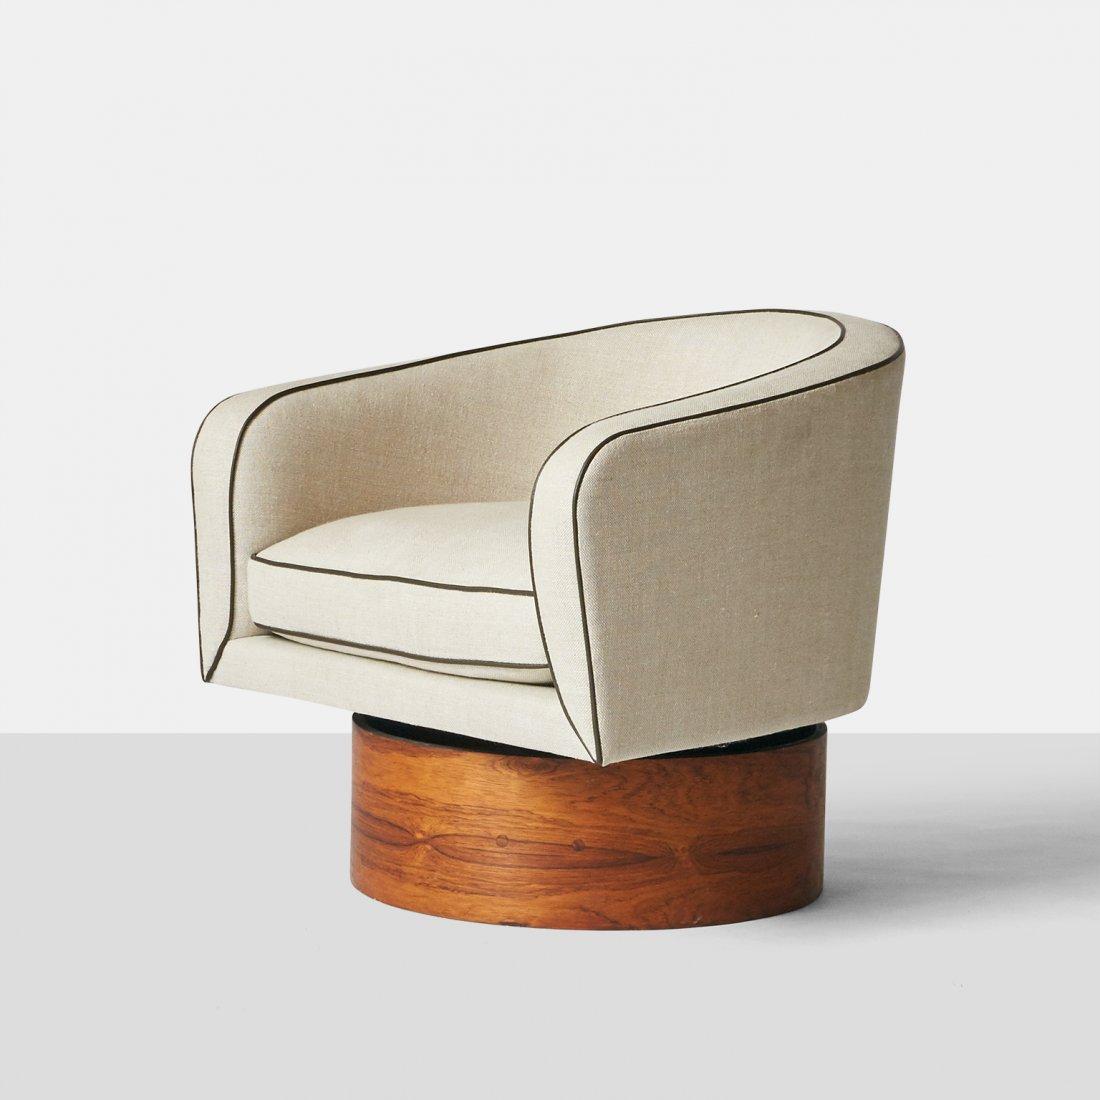 Milo Baughman, Swivel Chair